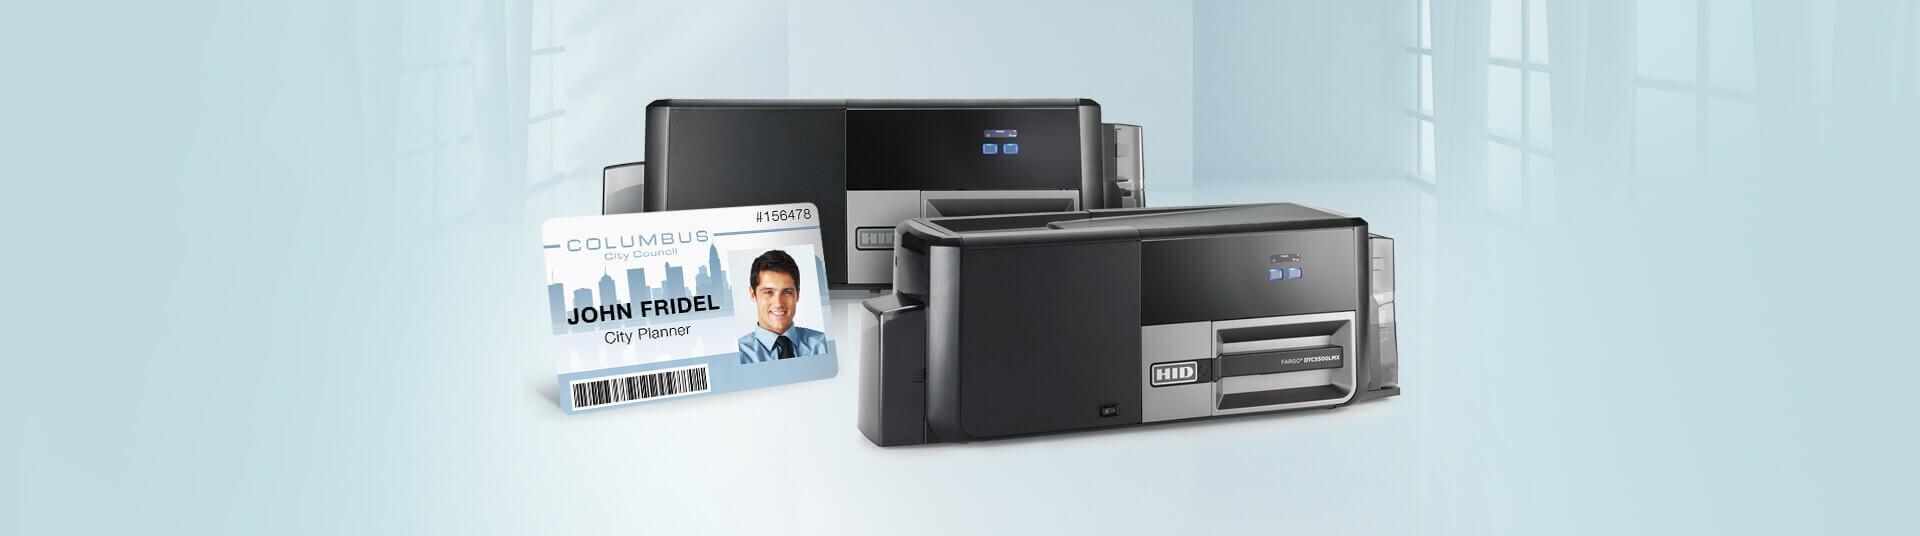 Fargo DTC5500LMX ID Card Printers